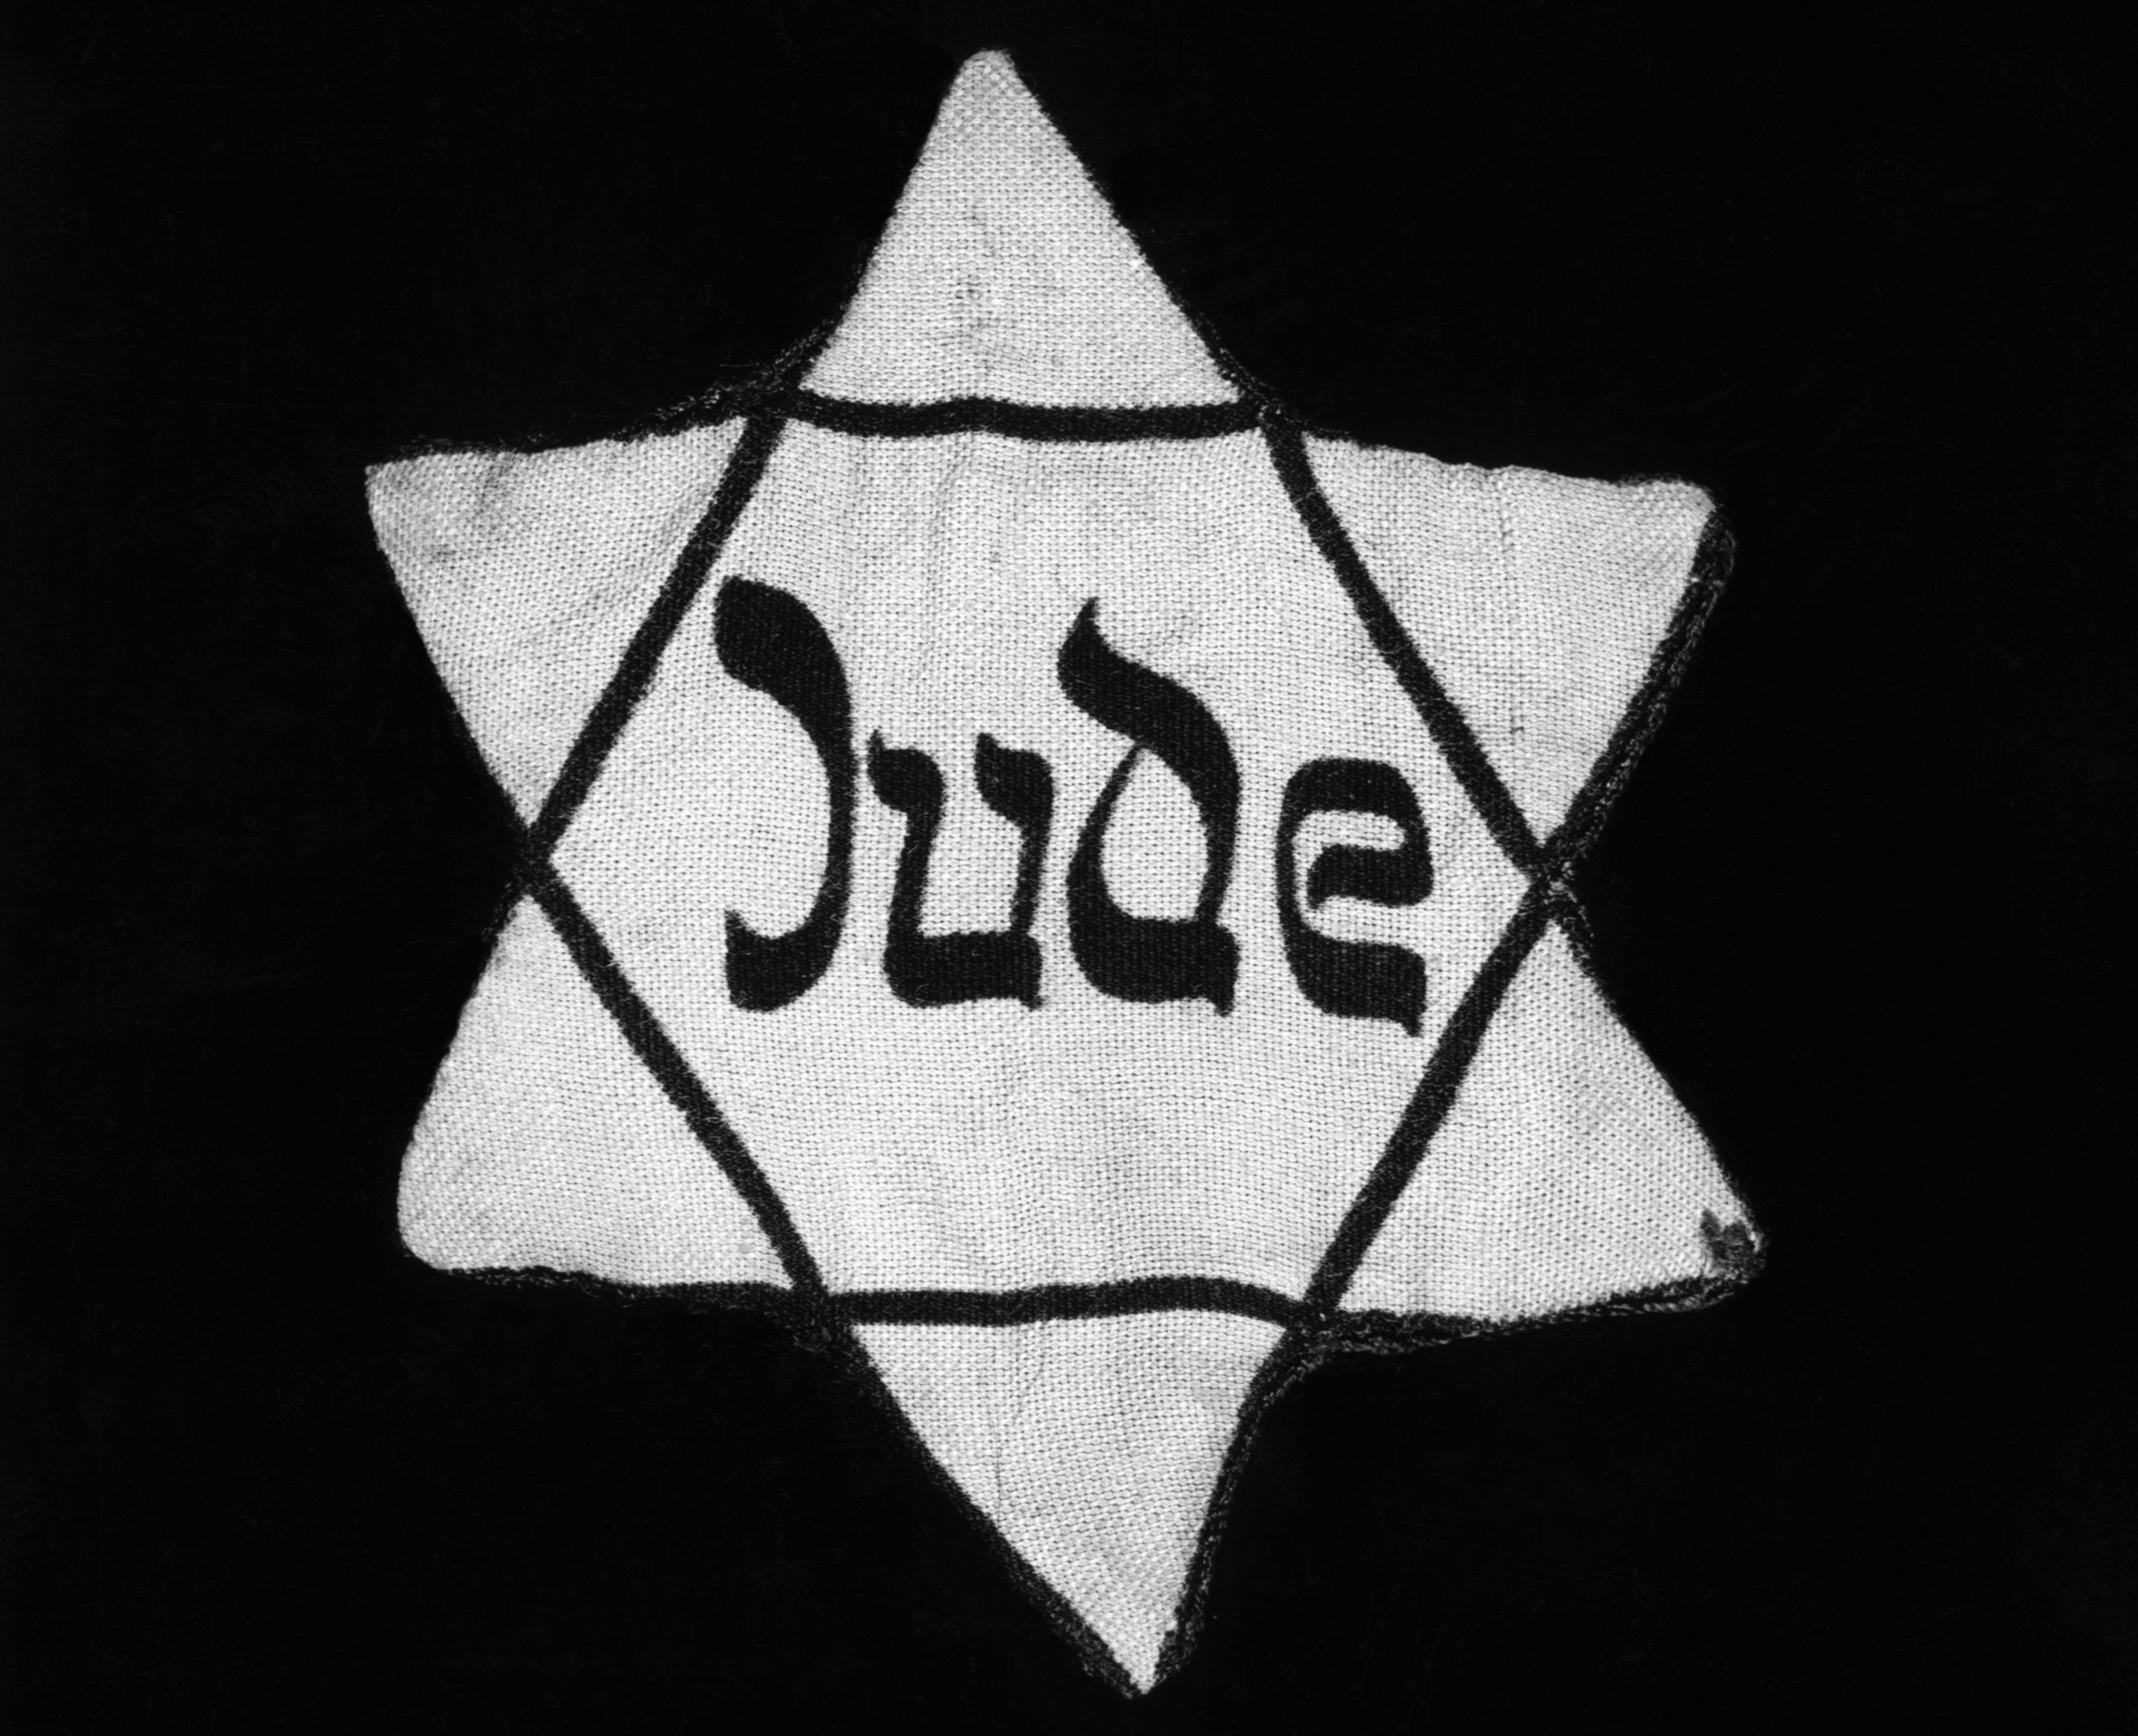 Yom HaShoah 2016: Remembering the 6 million Jewish people killed during the Nazi Holocaust